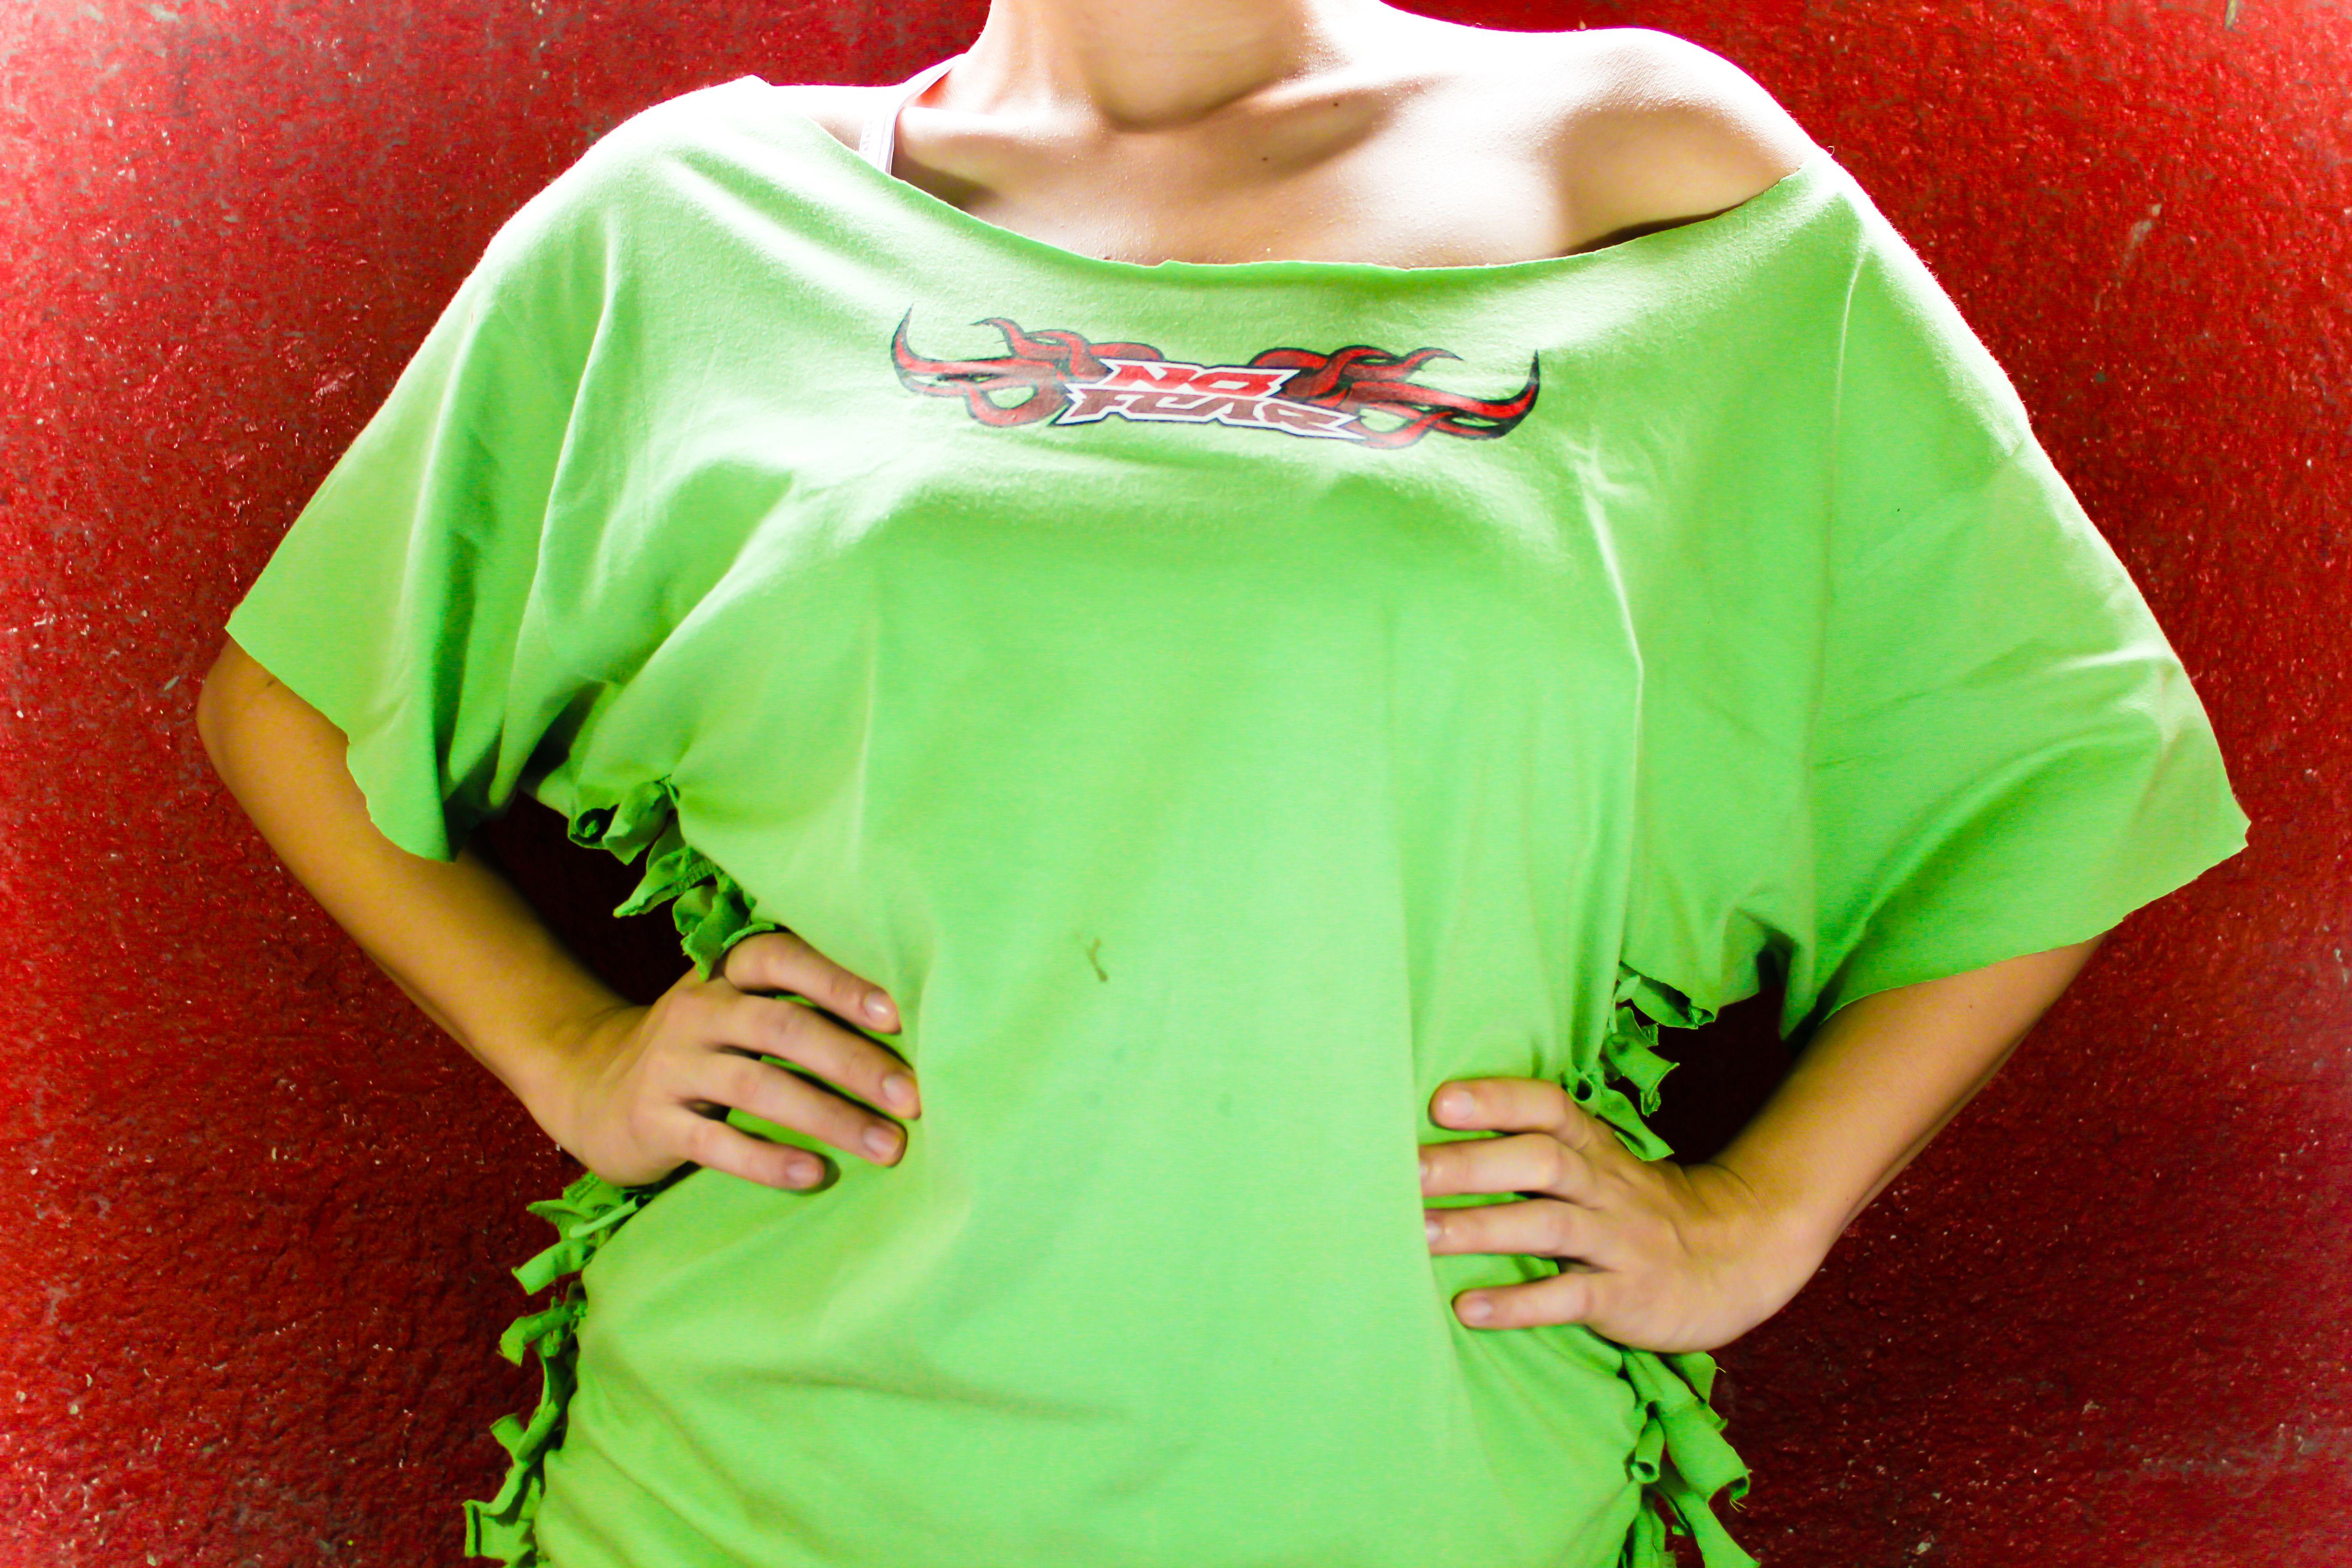 64edda76975c1 Make a style tee shirt diy ideas pinterest fashion jpg 5184x3456 80s style  diy